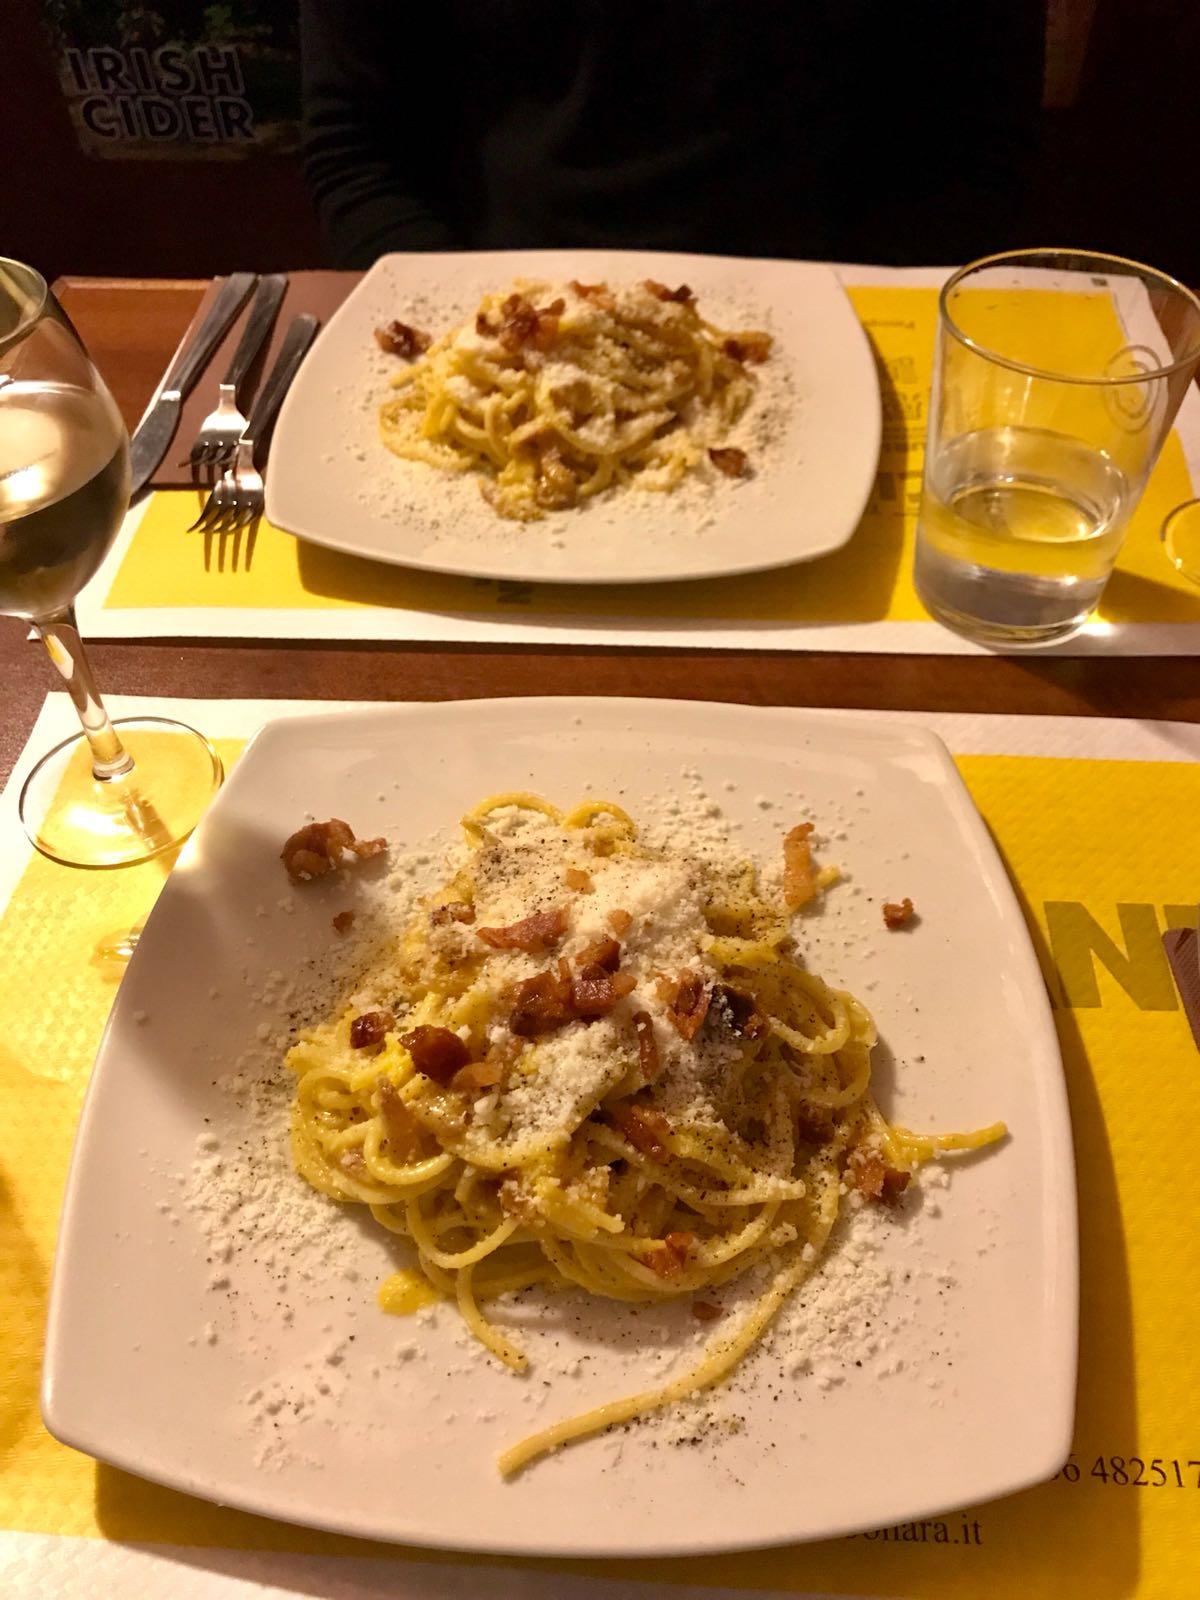 Carbonara from La Carbonara restaurant